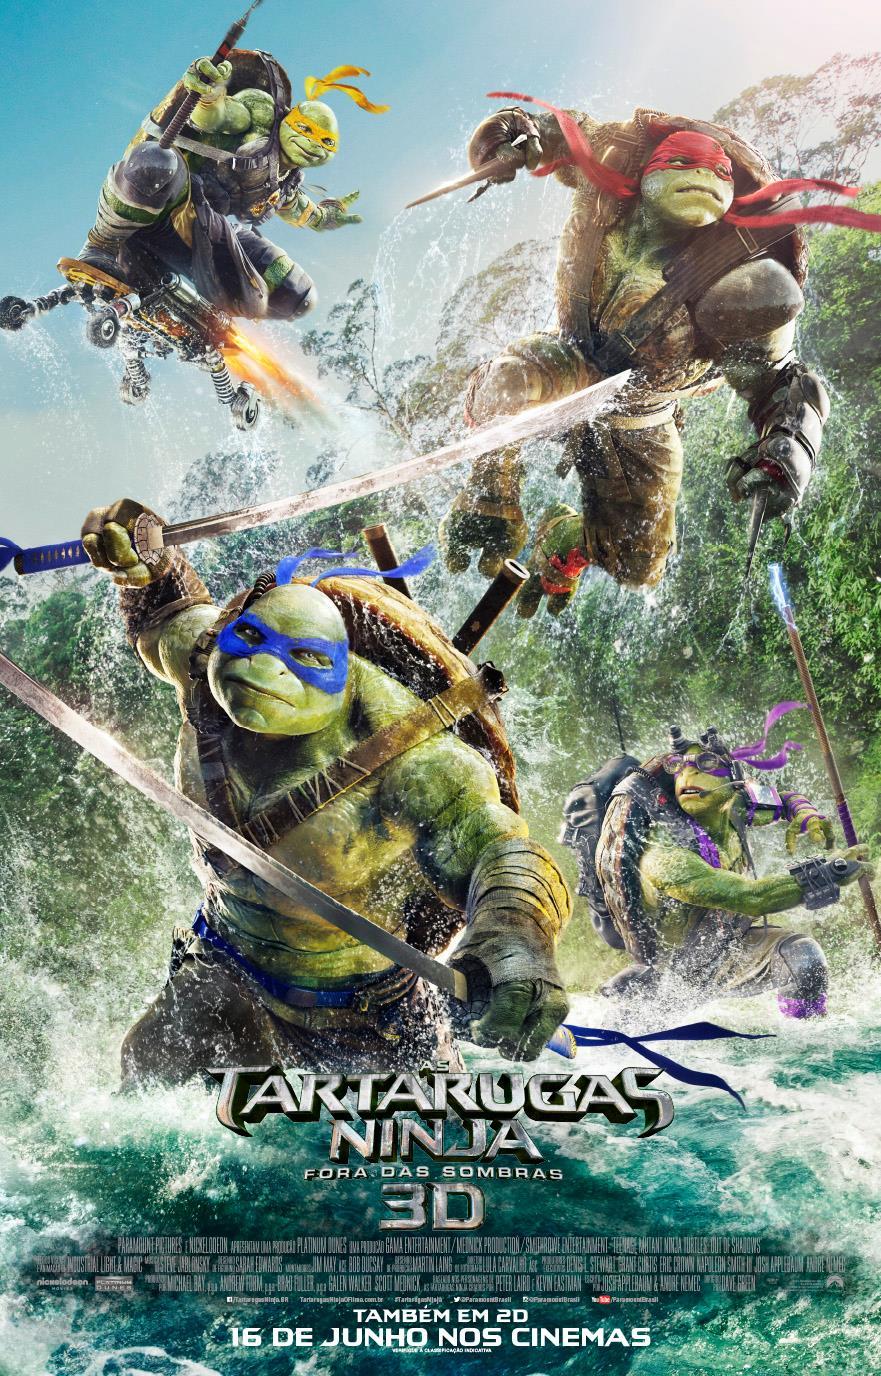 Assistir As Tartarugas Ninja: Fora das Sombras